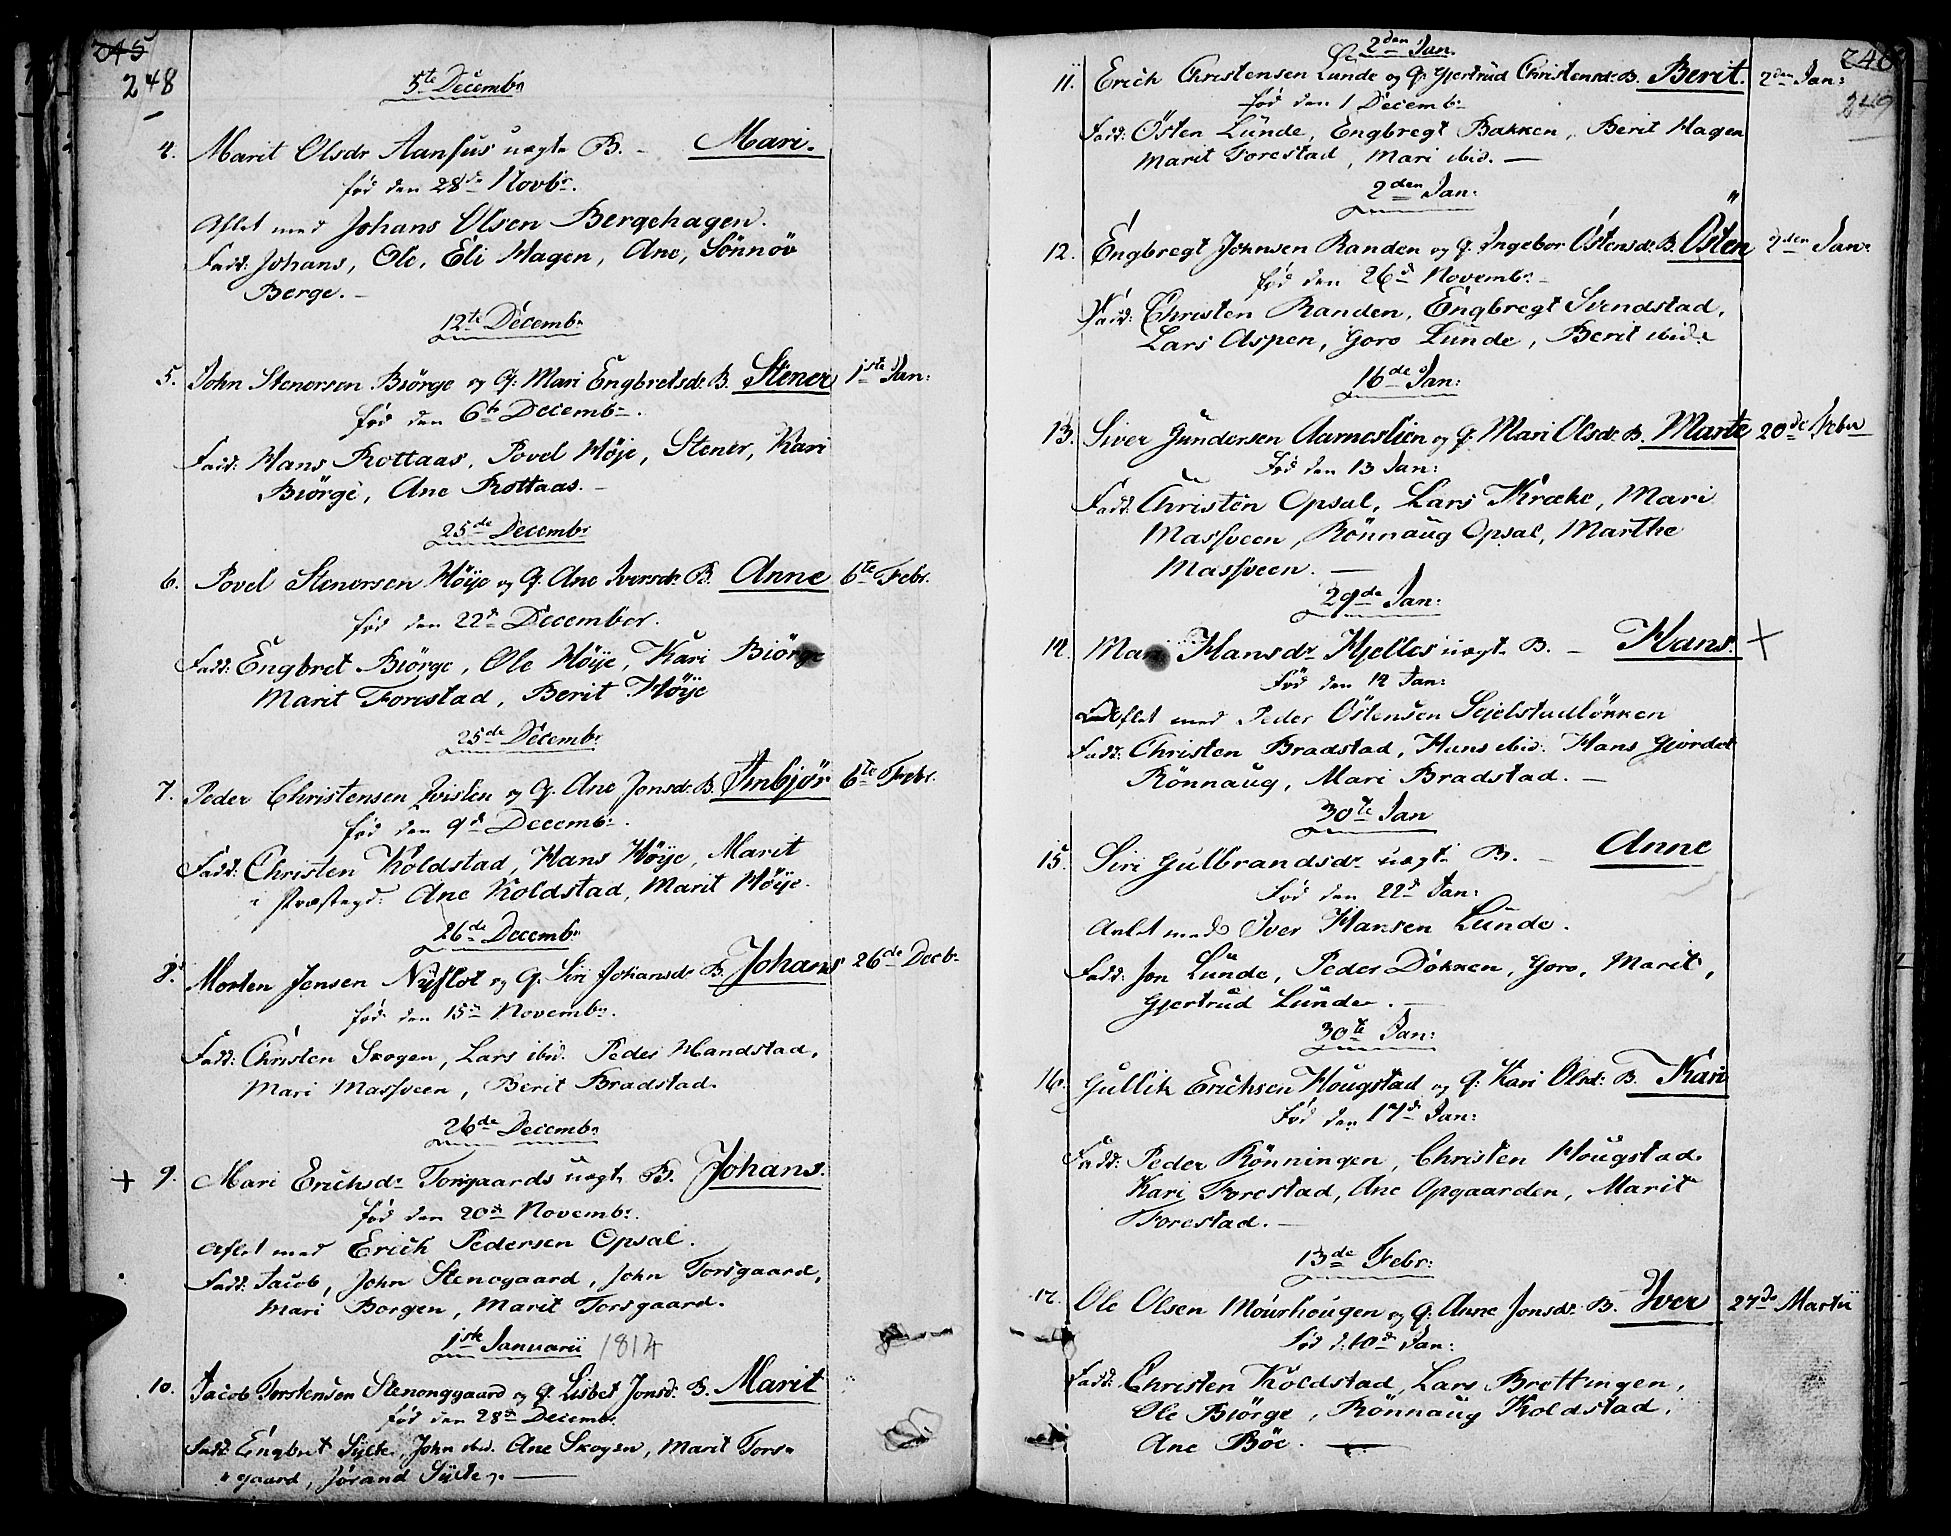 SAH, Ringebu prestekontor, Ministerialbok nr. 3, 1781-1820, s. 248-249